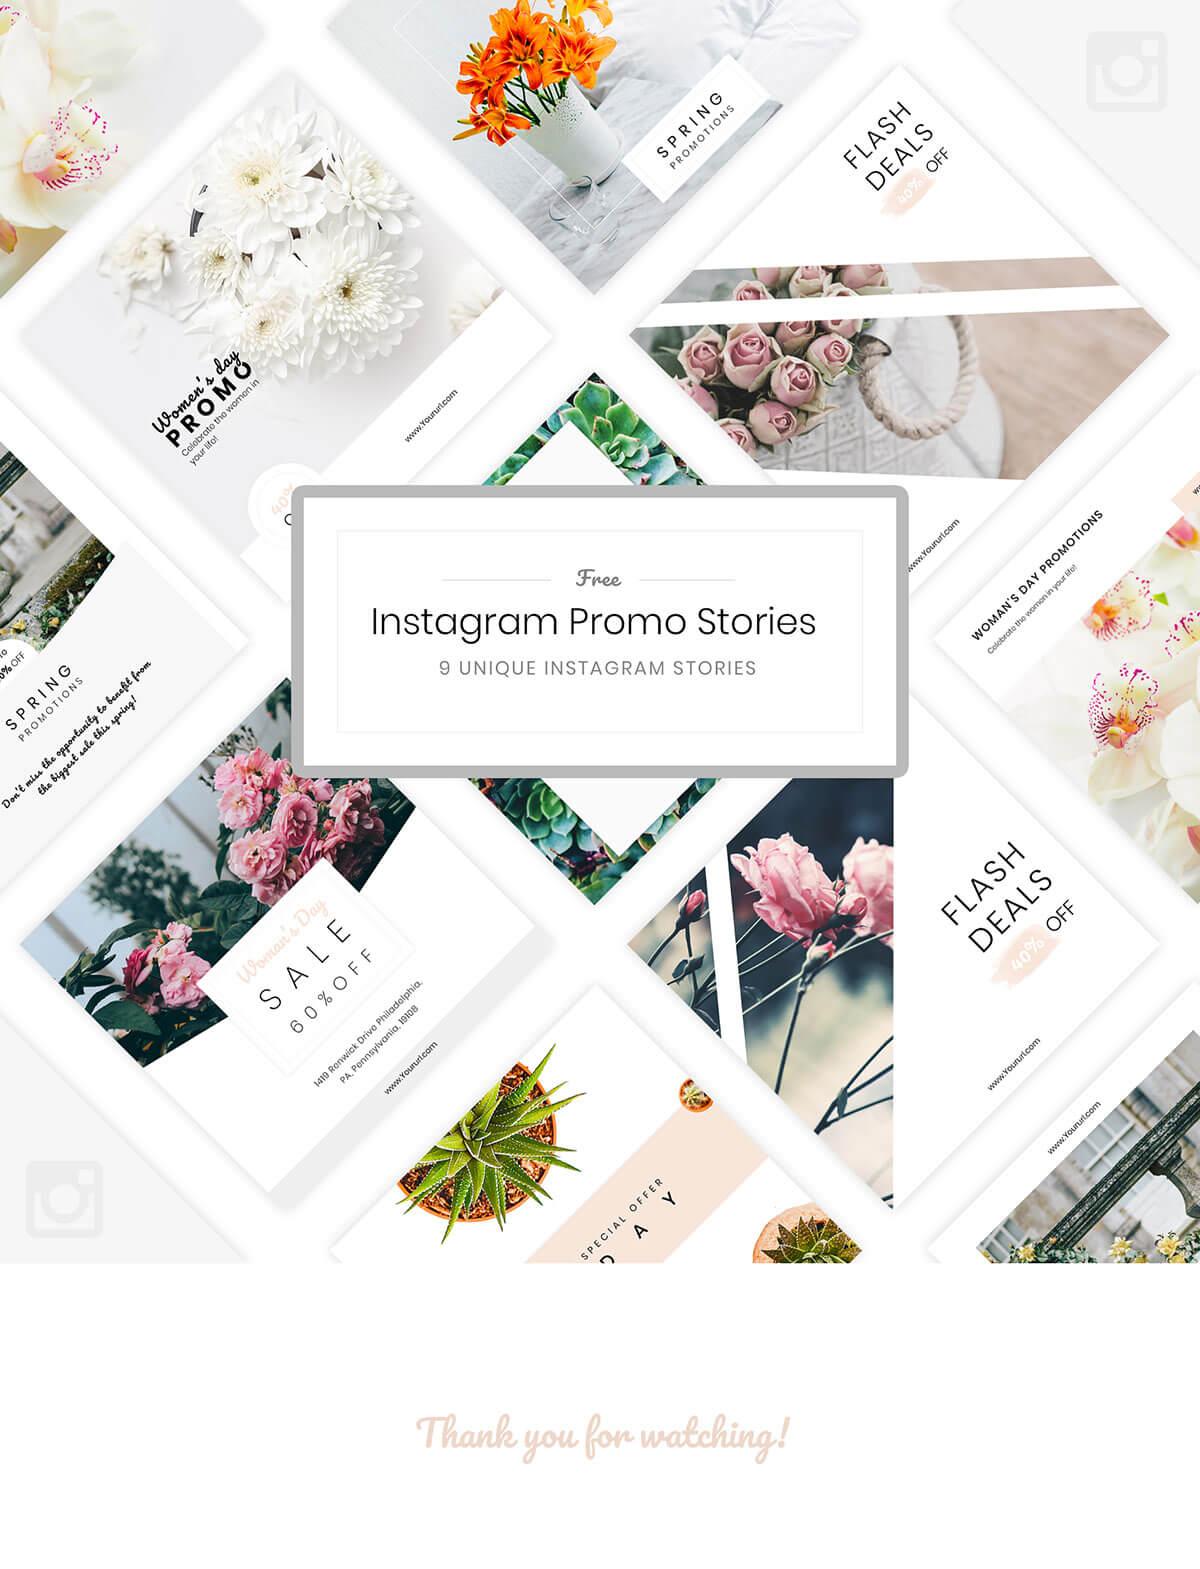 Free Instagram Promo Stories